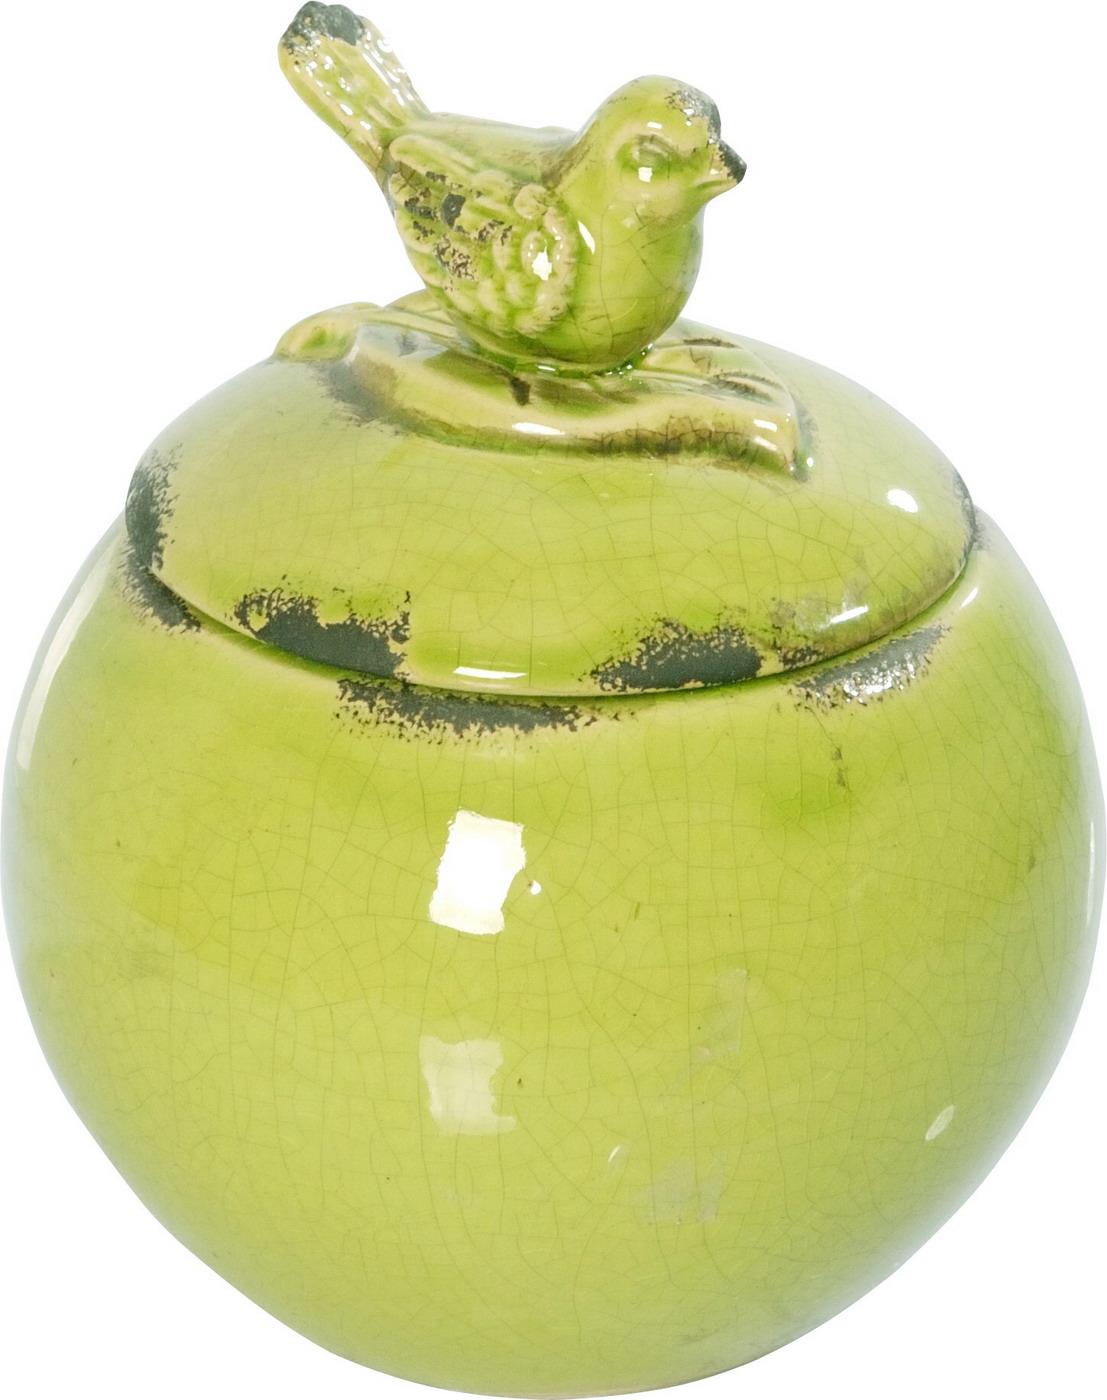 {} ARTEVALUCE Ваза с крышкой Птички Цвет: Зеленый (15х18 см) artevaluce ваза с крышкой orlenda цвет зеленый 11х17х51 см